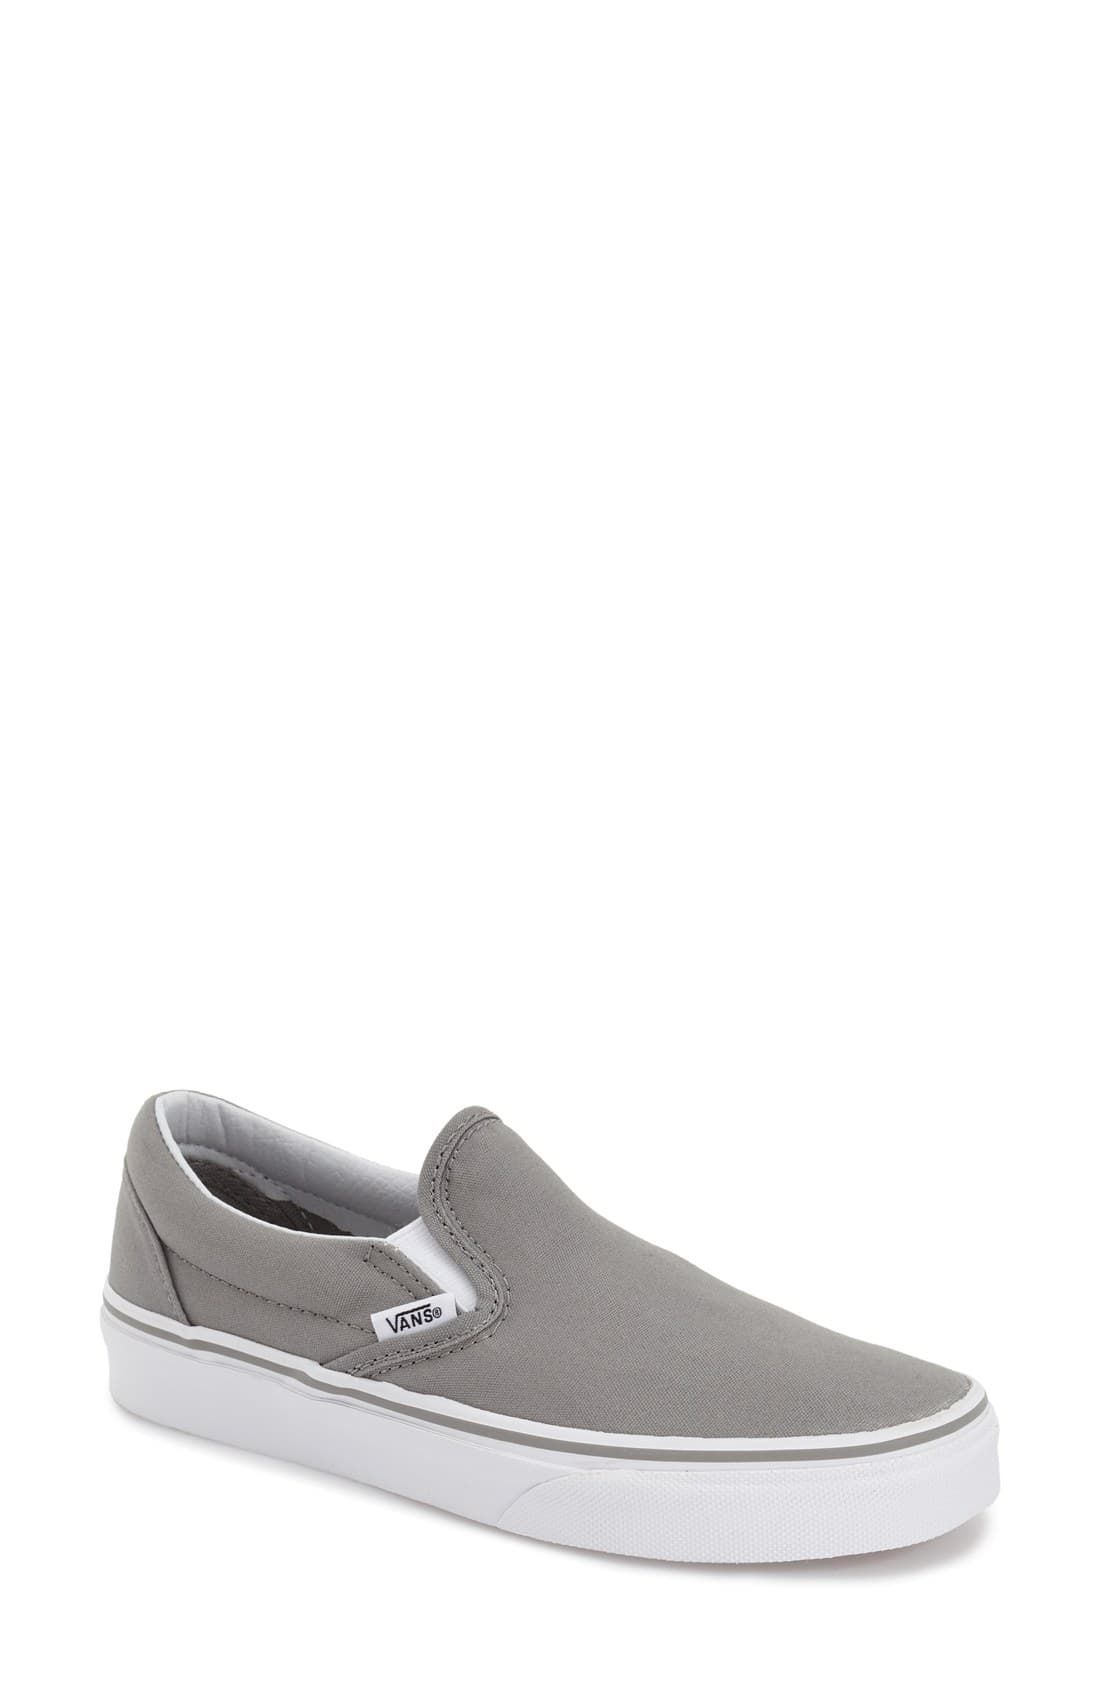 Women's Vans Classic Slip-On Sneaker